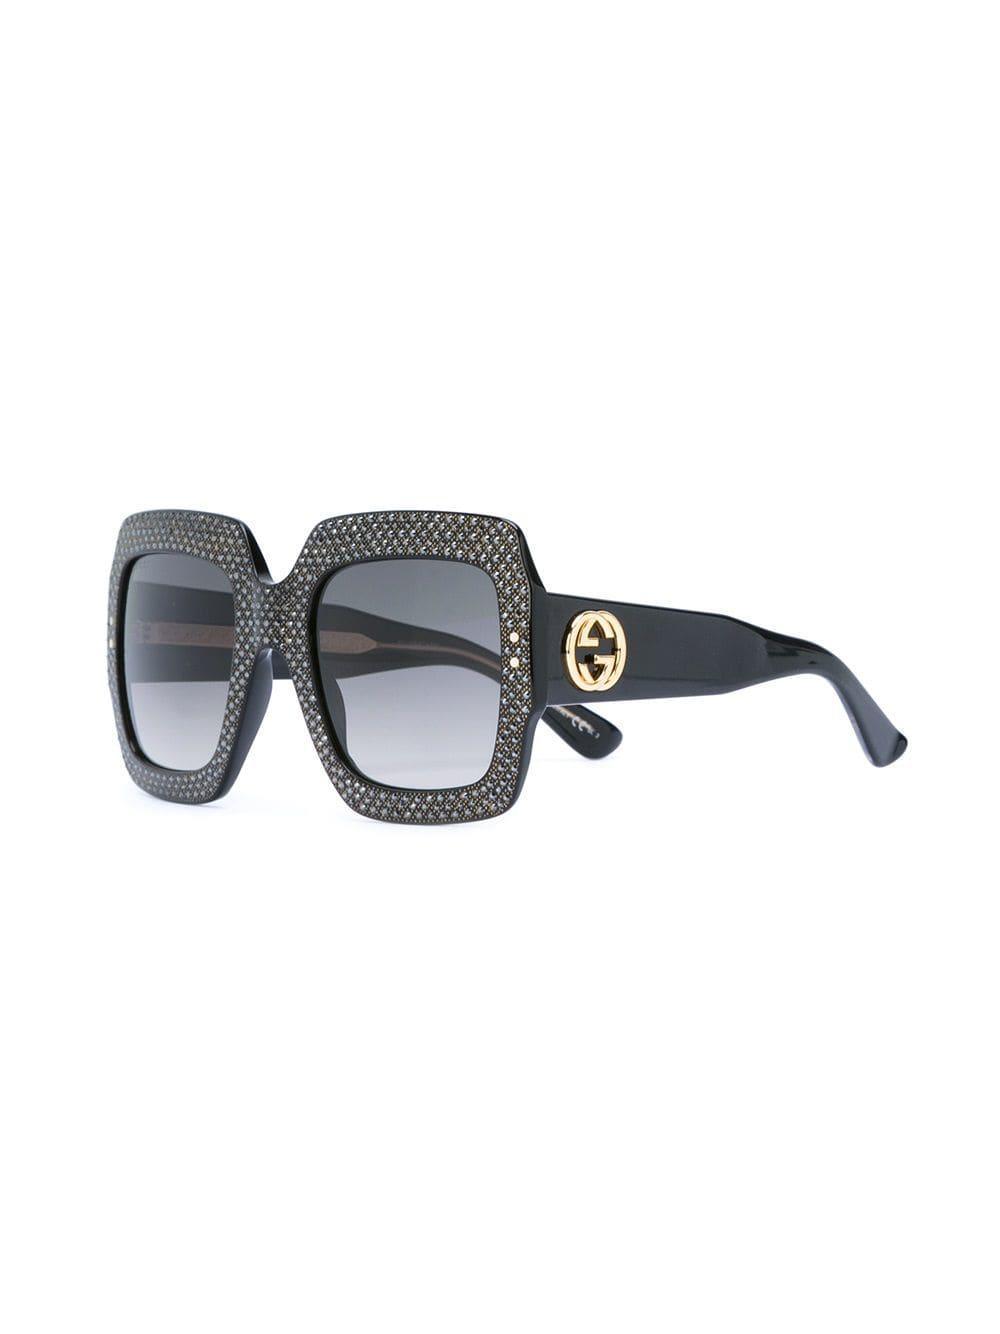 bb443ecd17f Gucci Embellished Frame Sunglasses in Black - Lyst